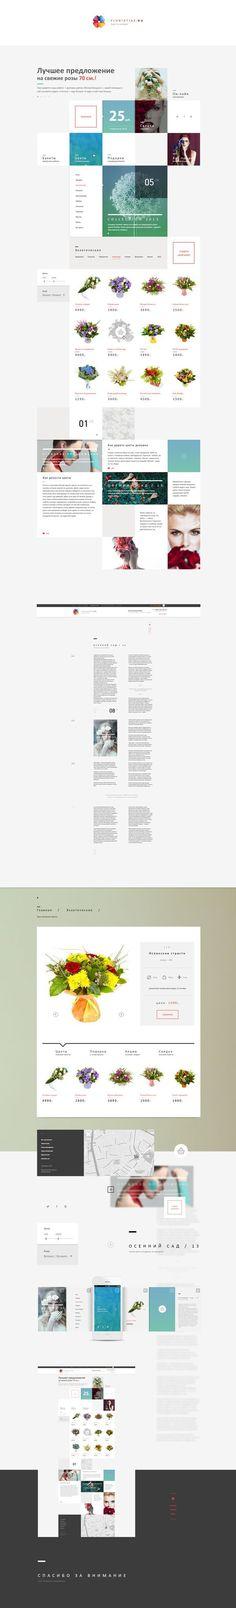 533a7d9886e5f.jpg 600×4.089 pixels | Design: Digital | Pinterest